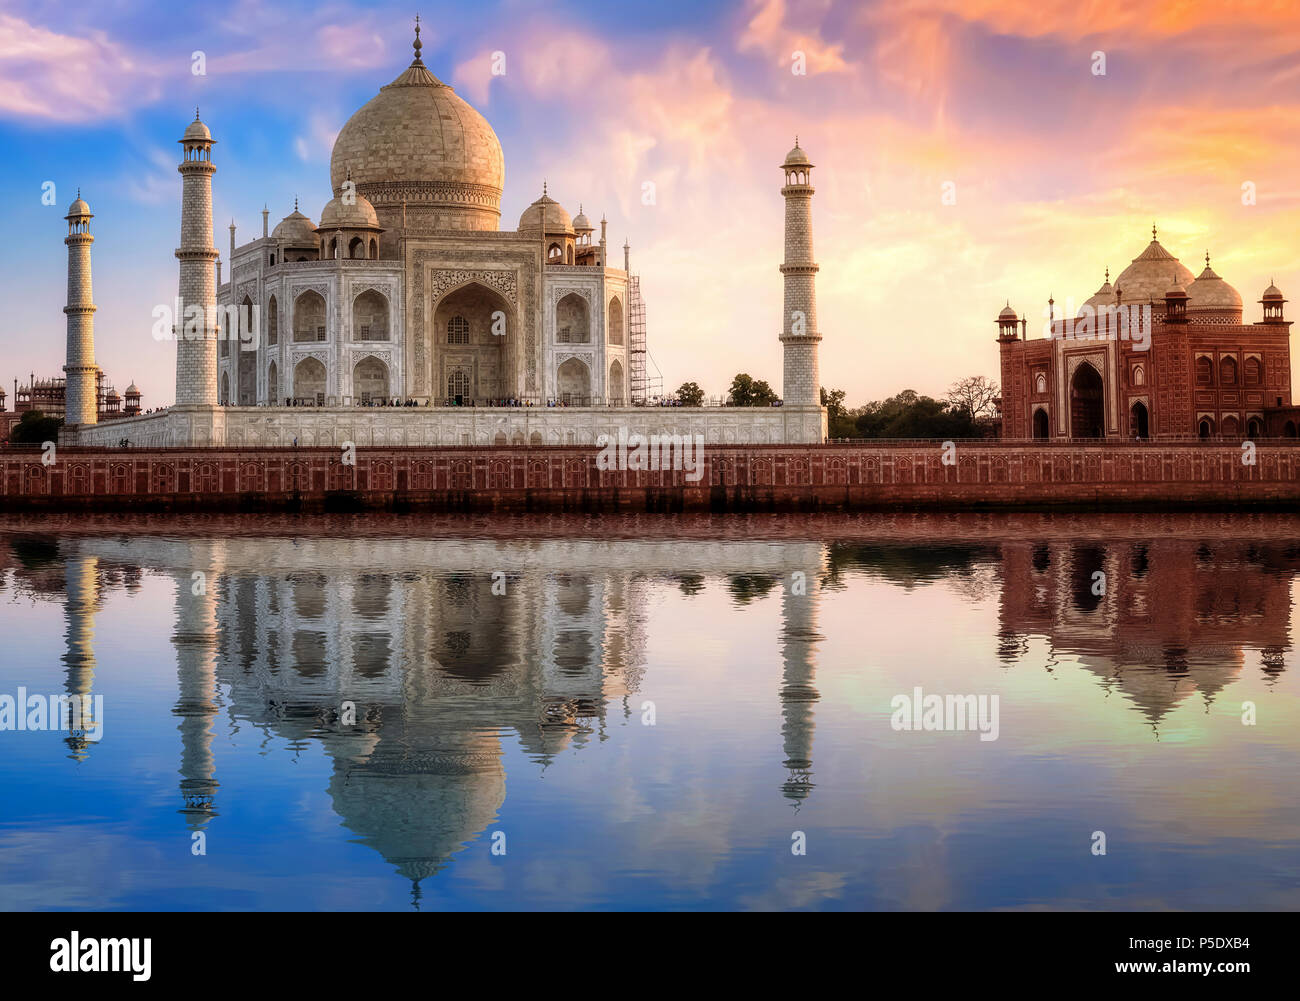 Taj Mahal Agra India con East Gate al atardecer con cielo de Moody. Imagen De Stock